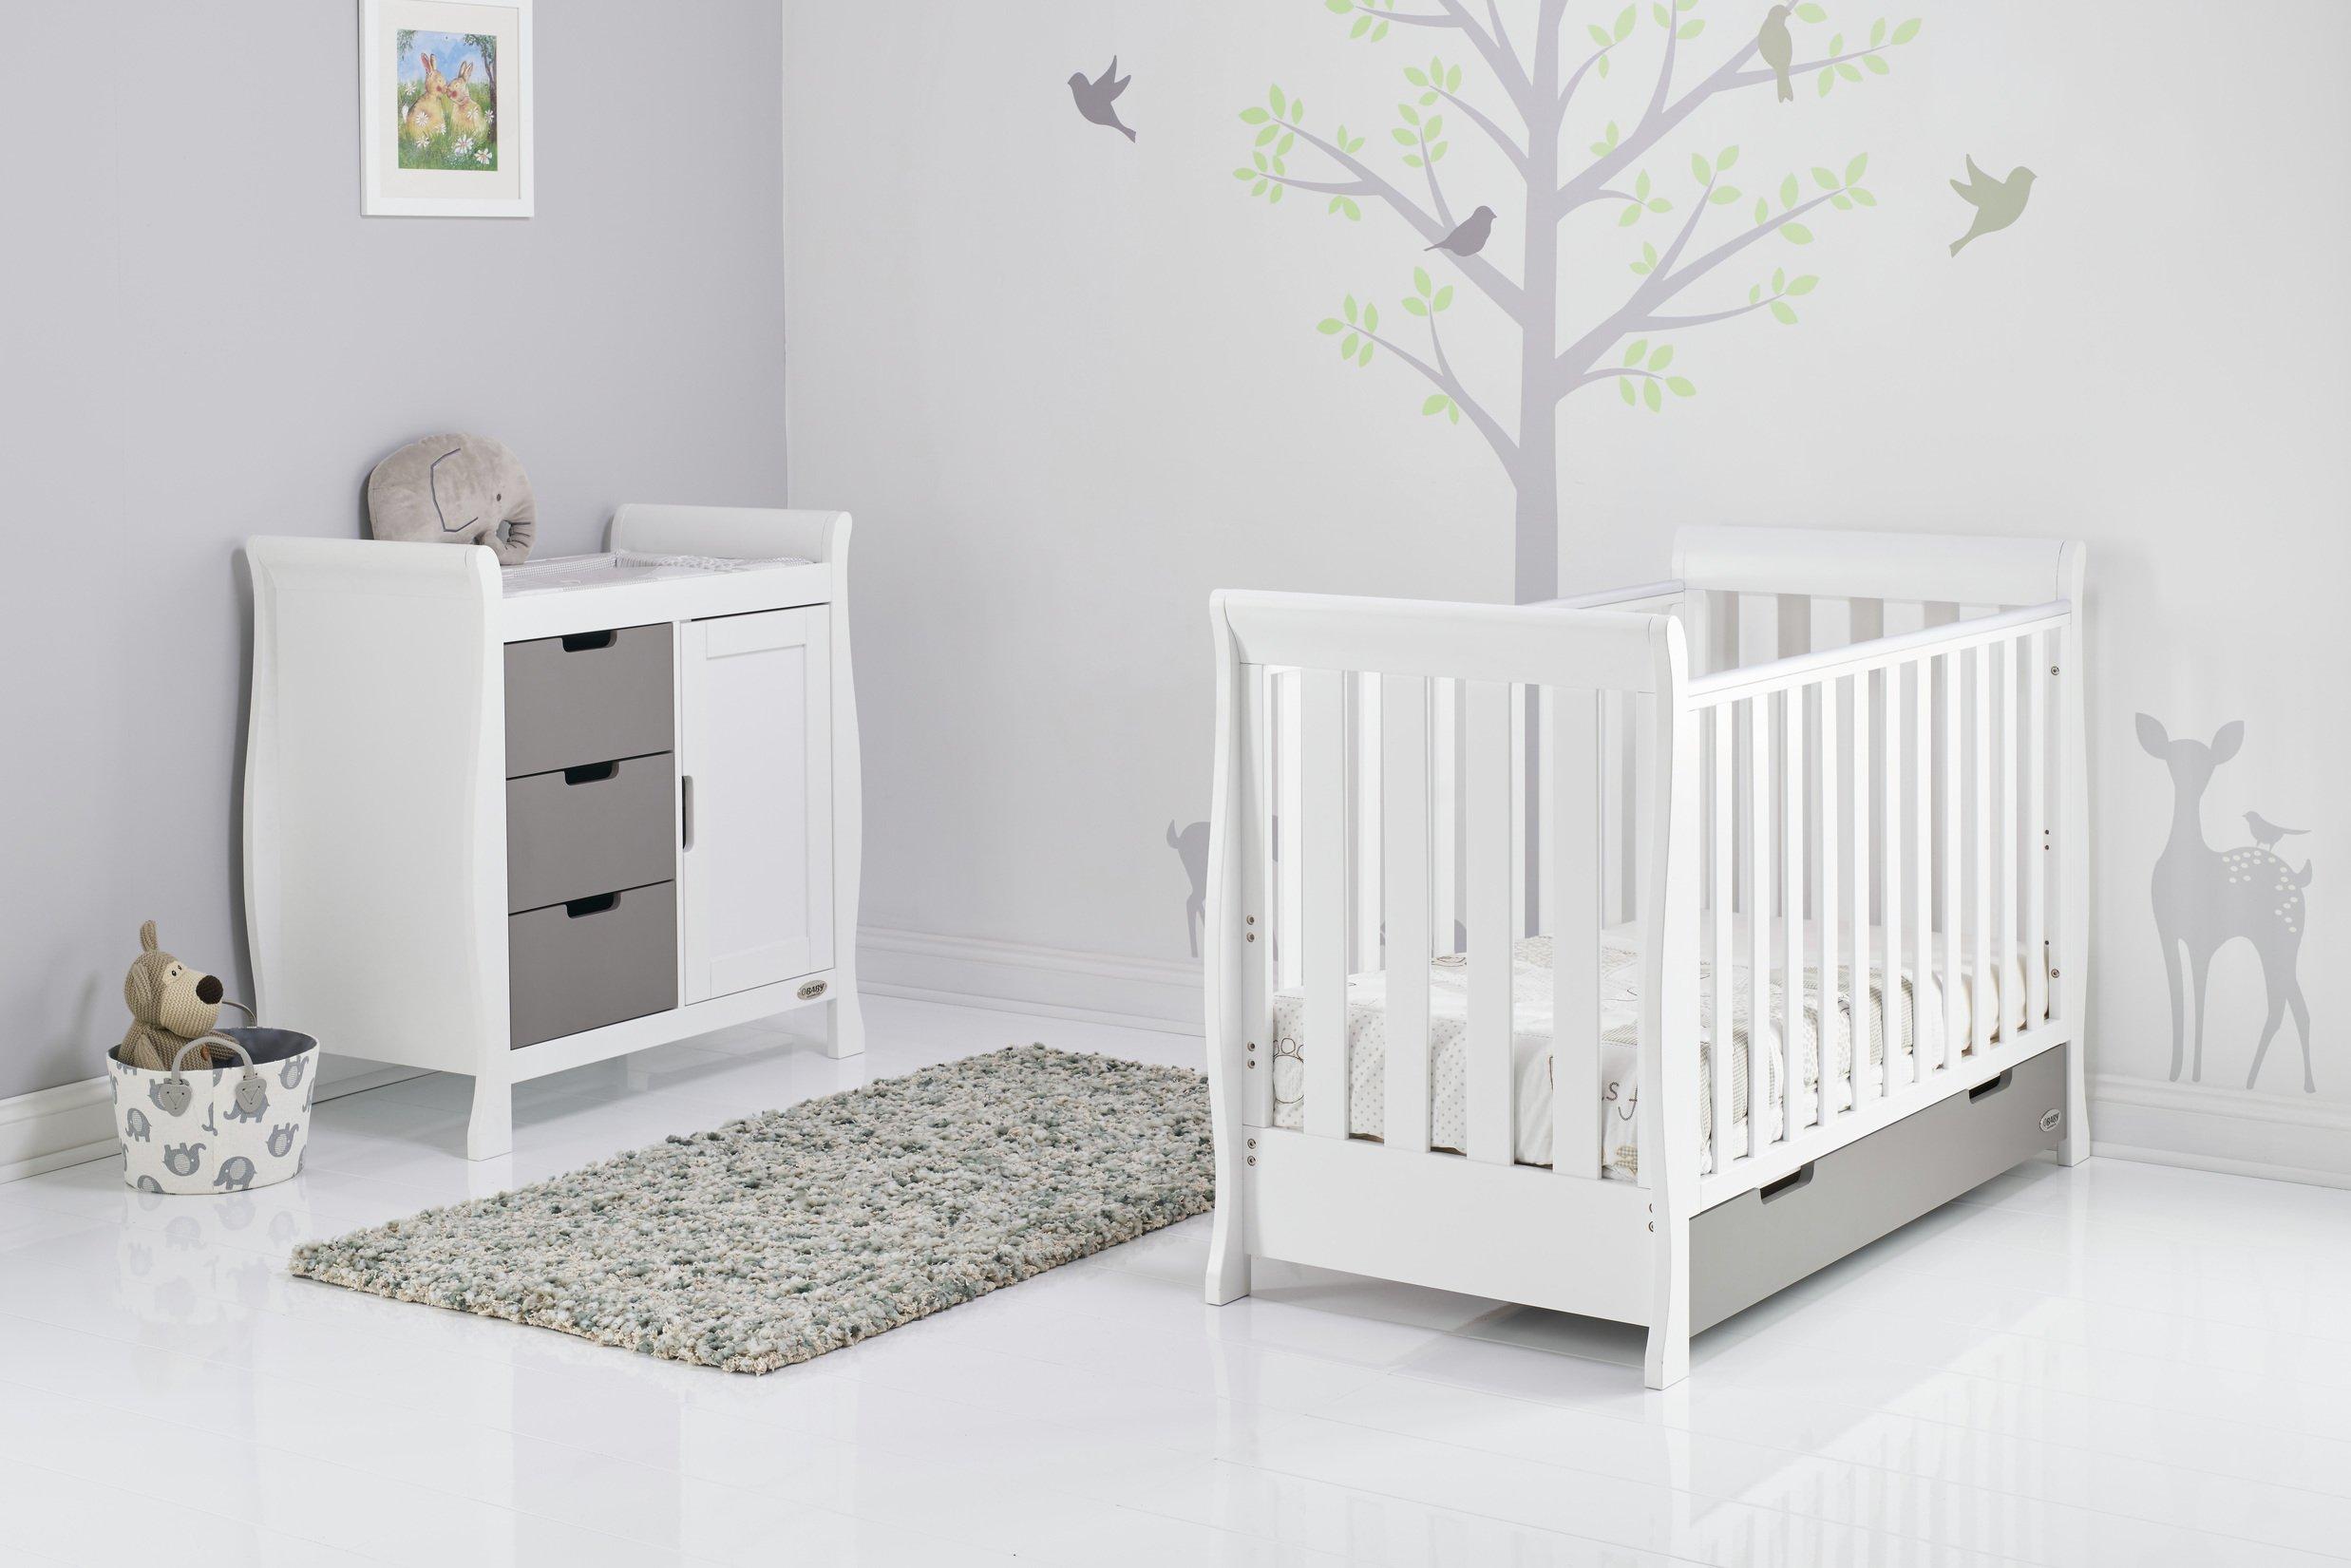 Obaby Stamford Mini Sleigh 2 Piece Room Set - White & Grey